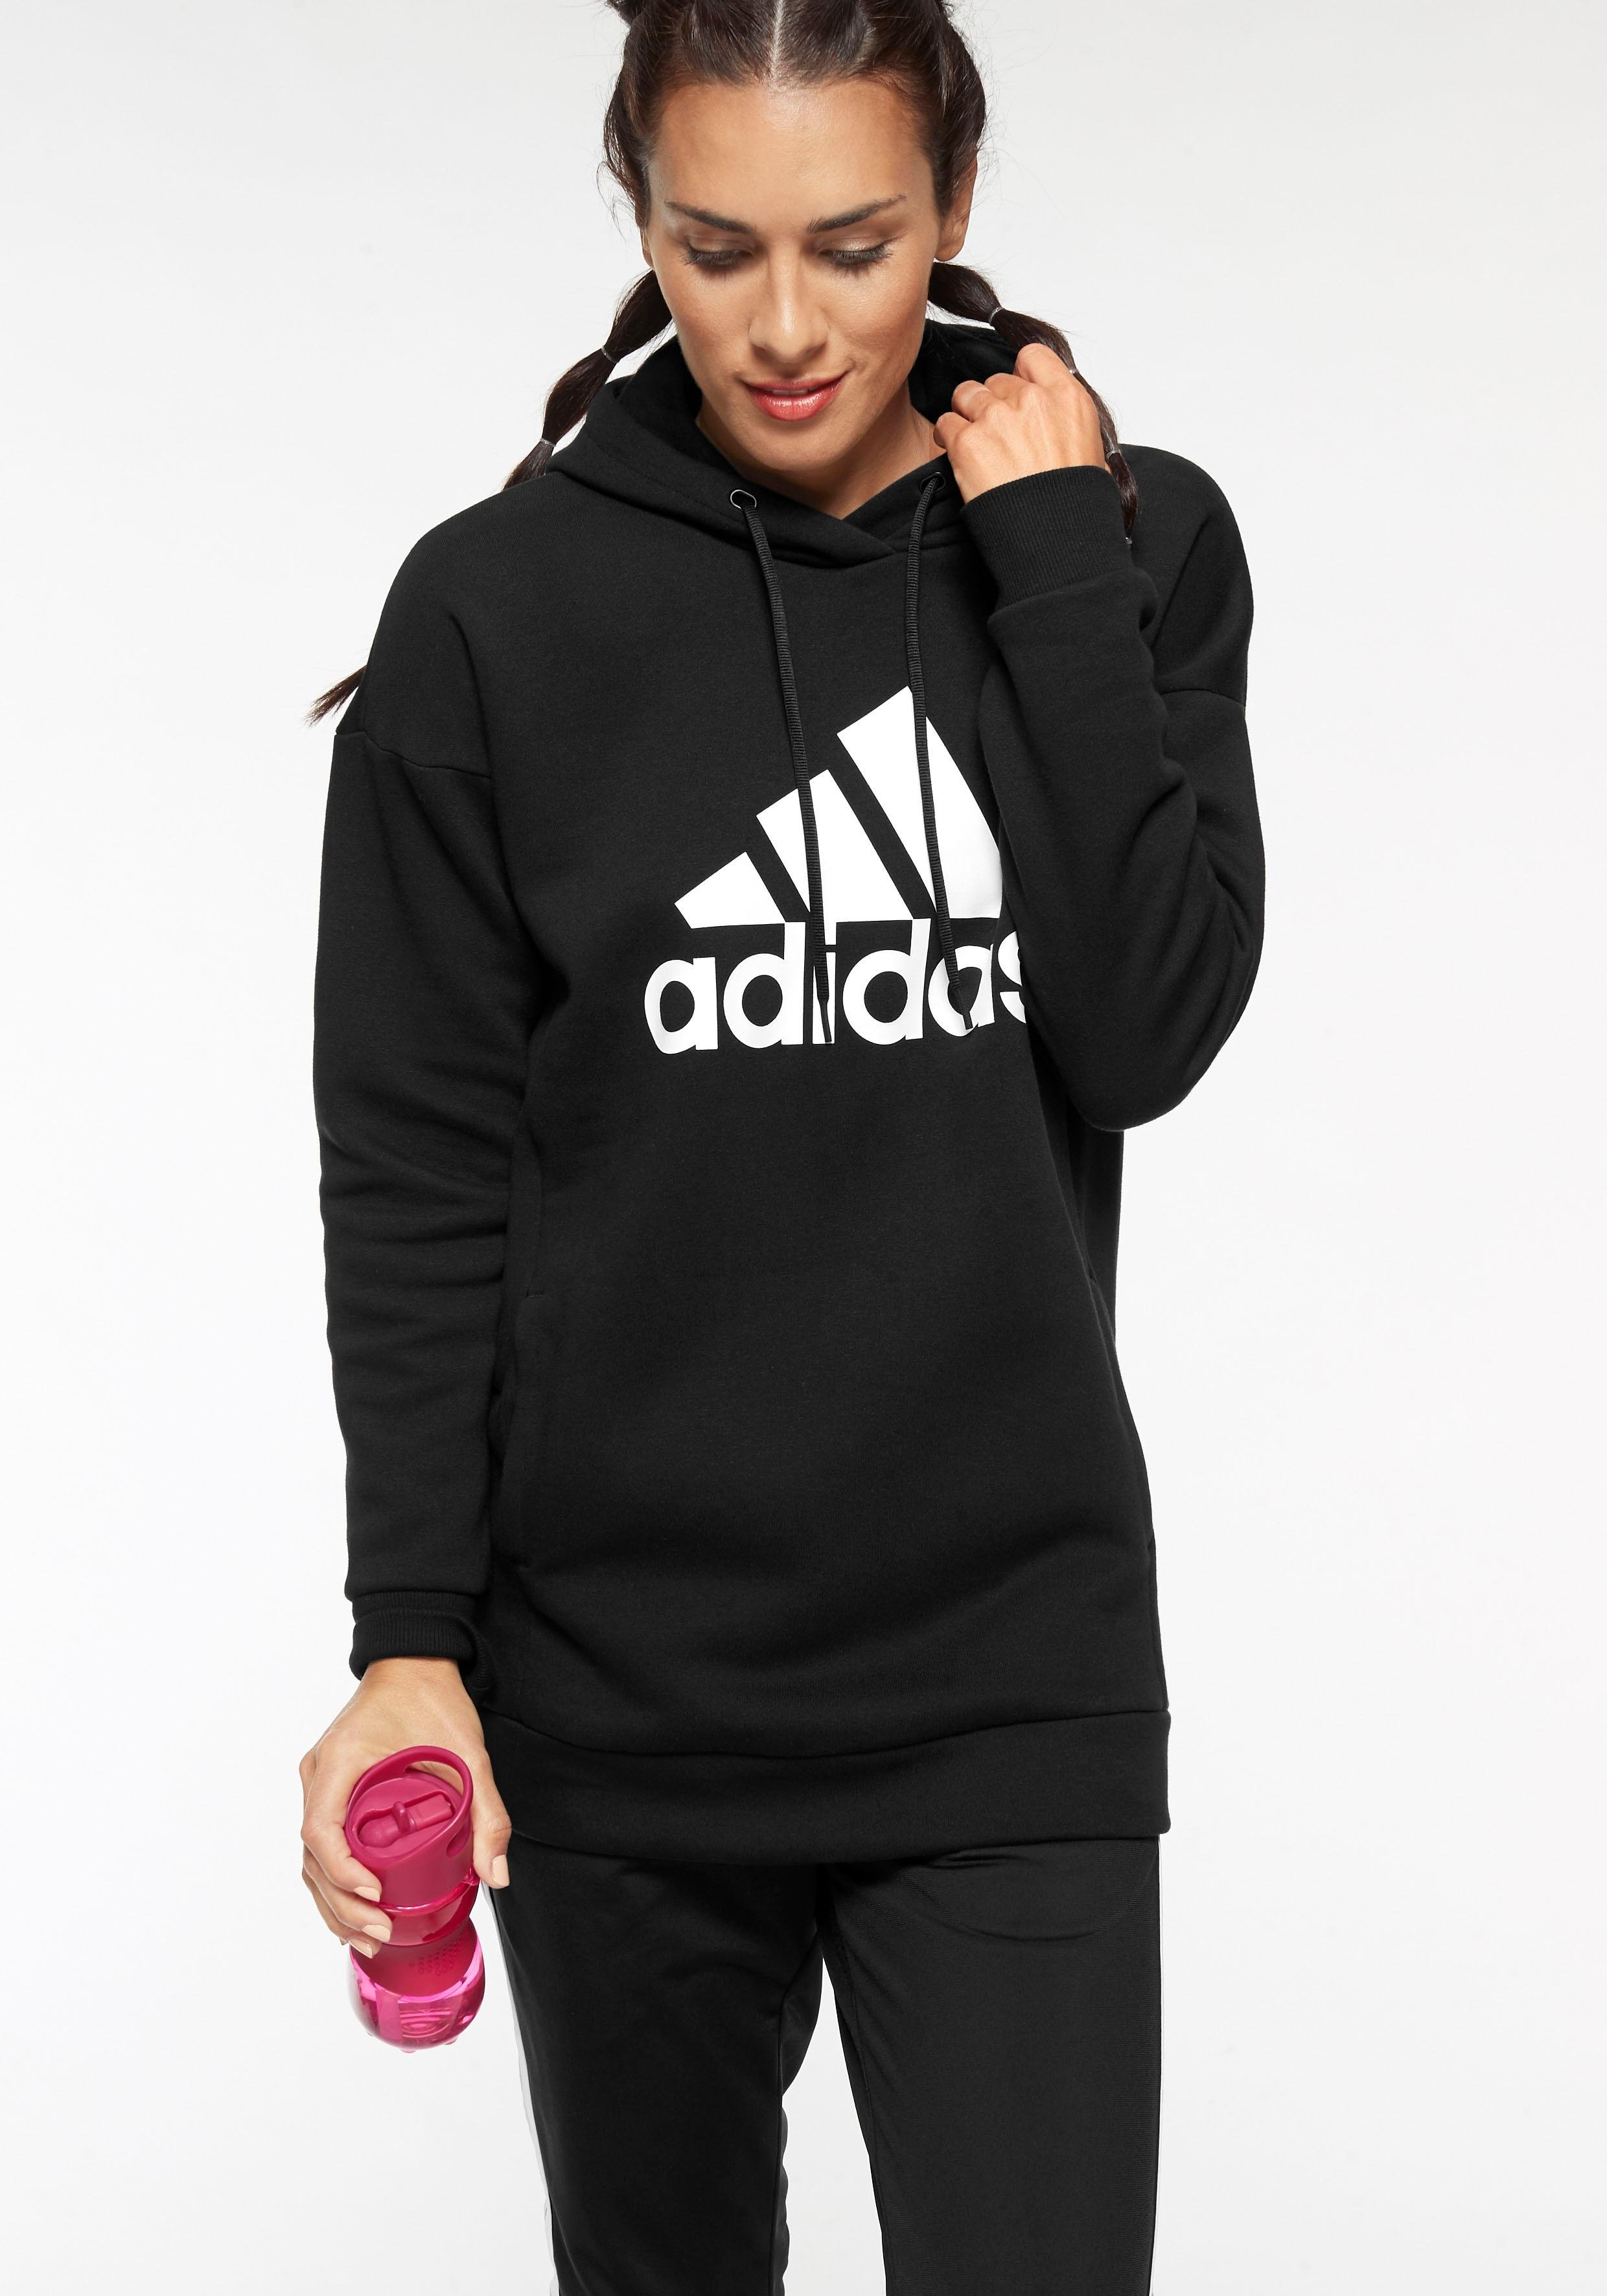 adidas Performance hoodie »W MH BATCH OF SPORTS OH HOODY« bestellen: 14 dagen bedenktijd